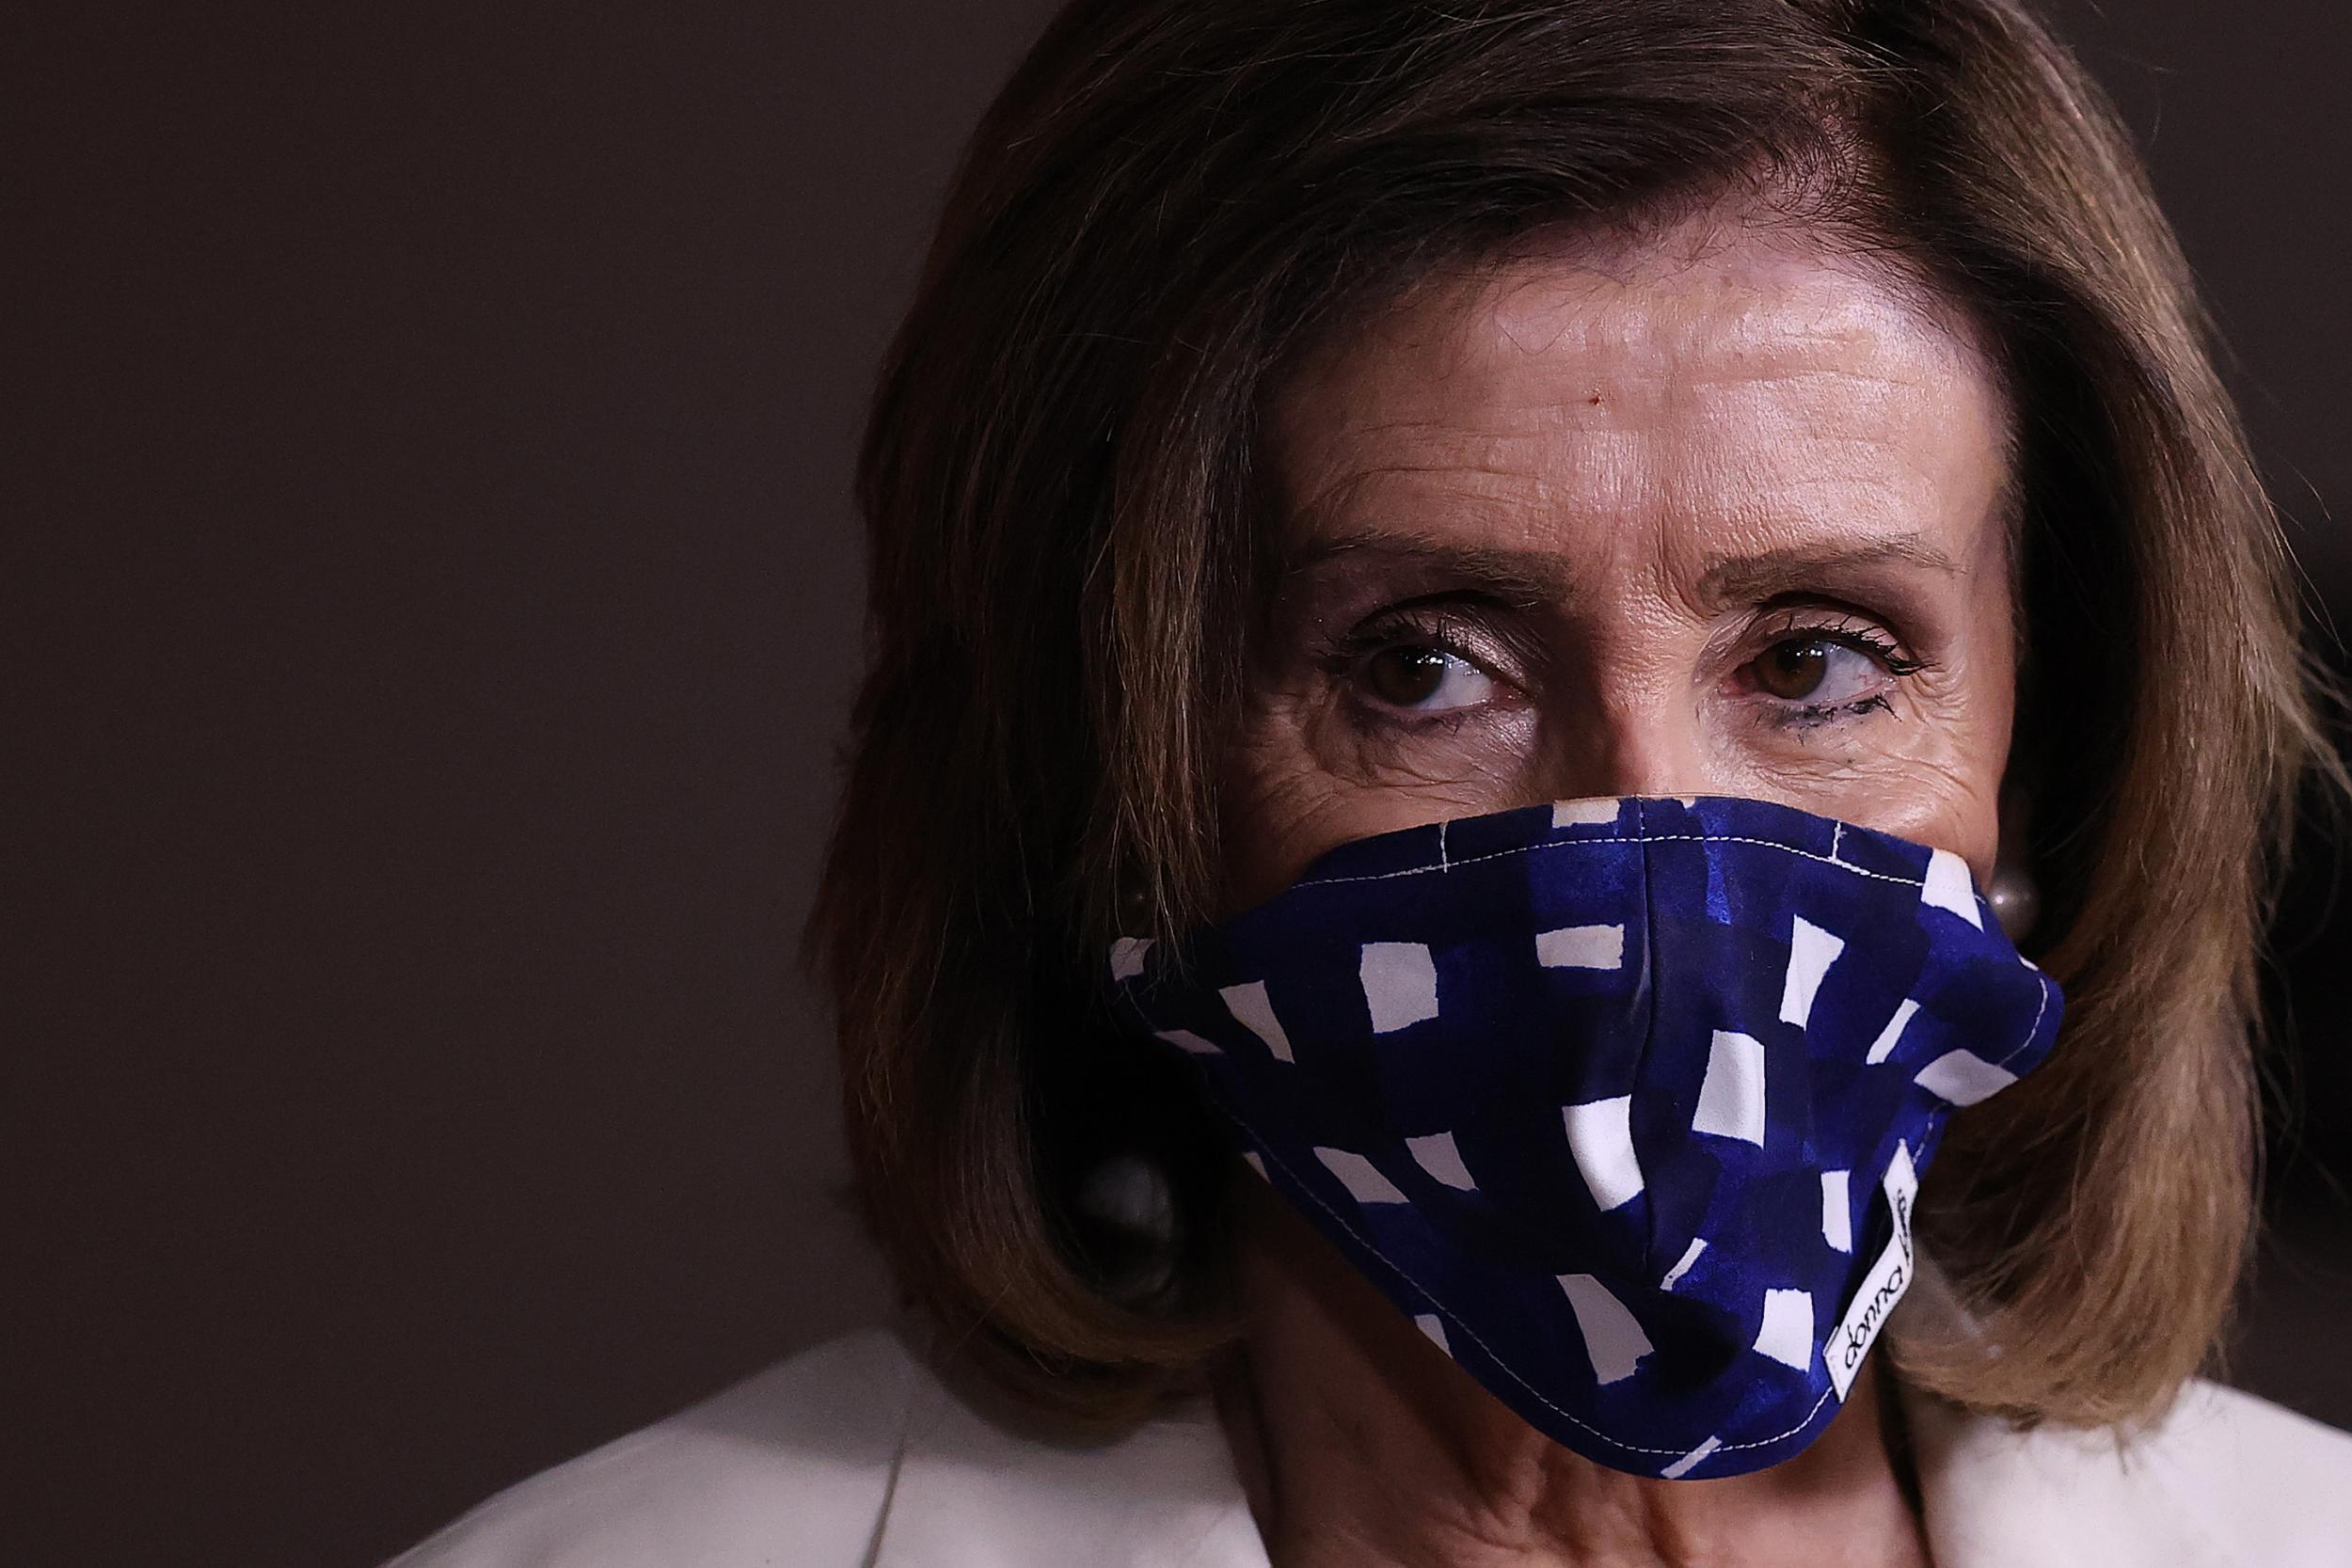 Nancy Pelosi calls GOP tax law a 'scam' as he defends $3trn Democratic coronavirus bill